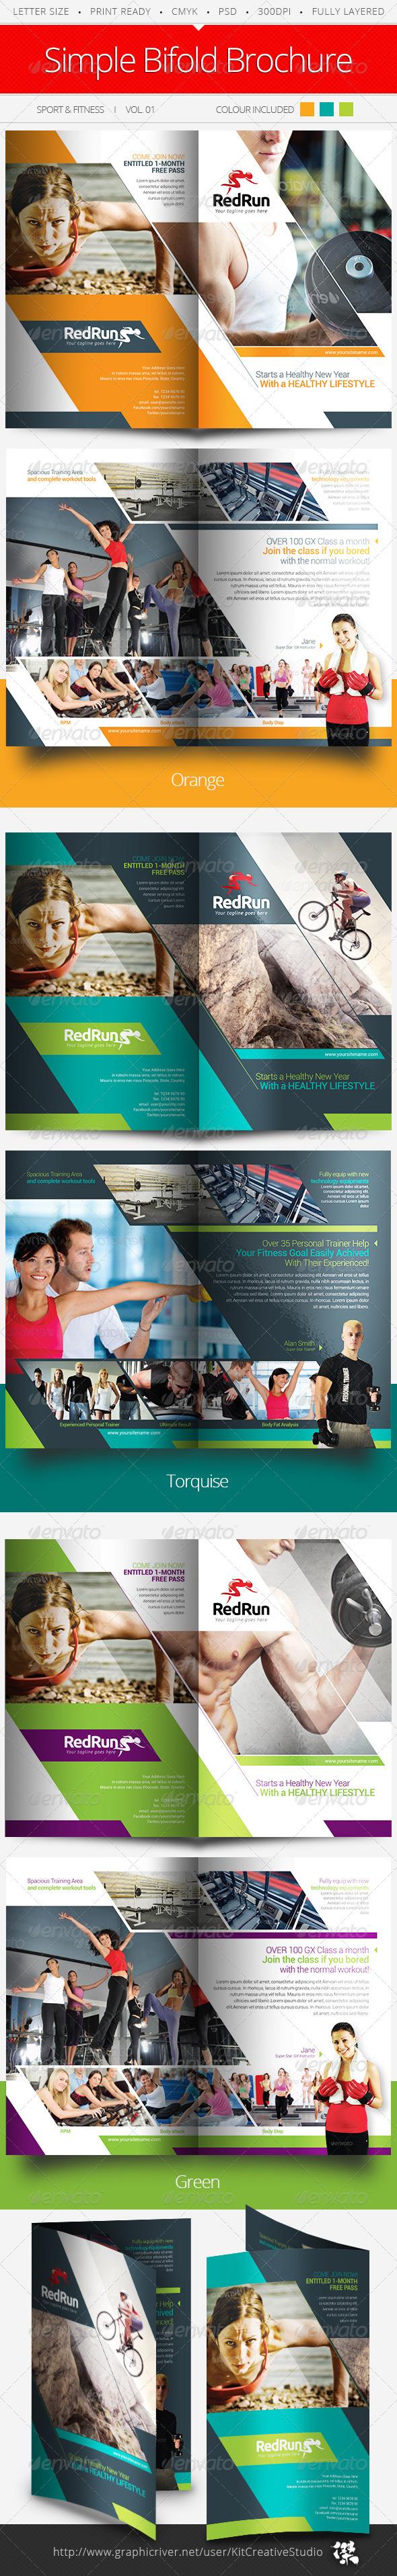 GraphicRiver Sport & Fitness Bifold Brochure Vol.01 6511915